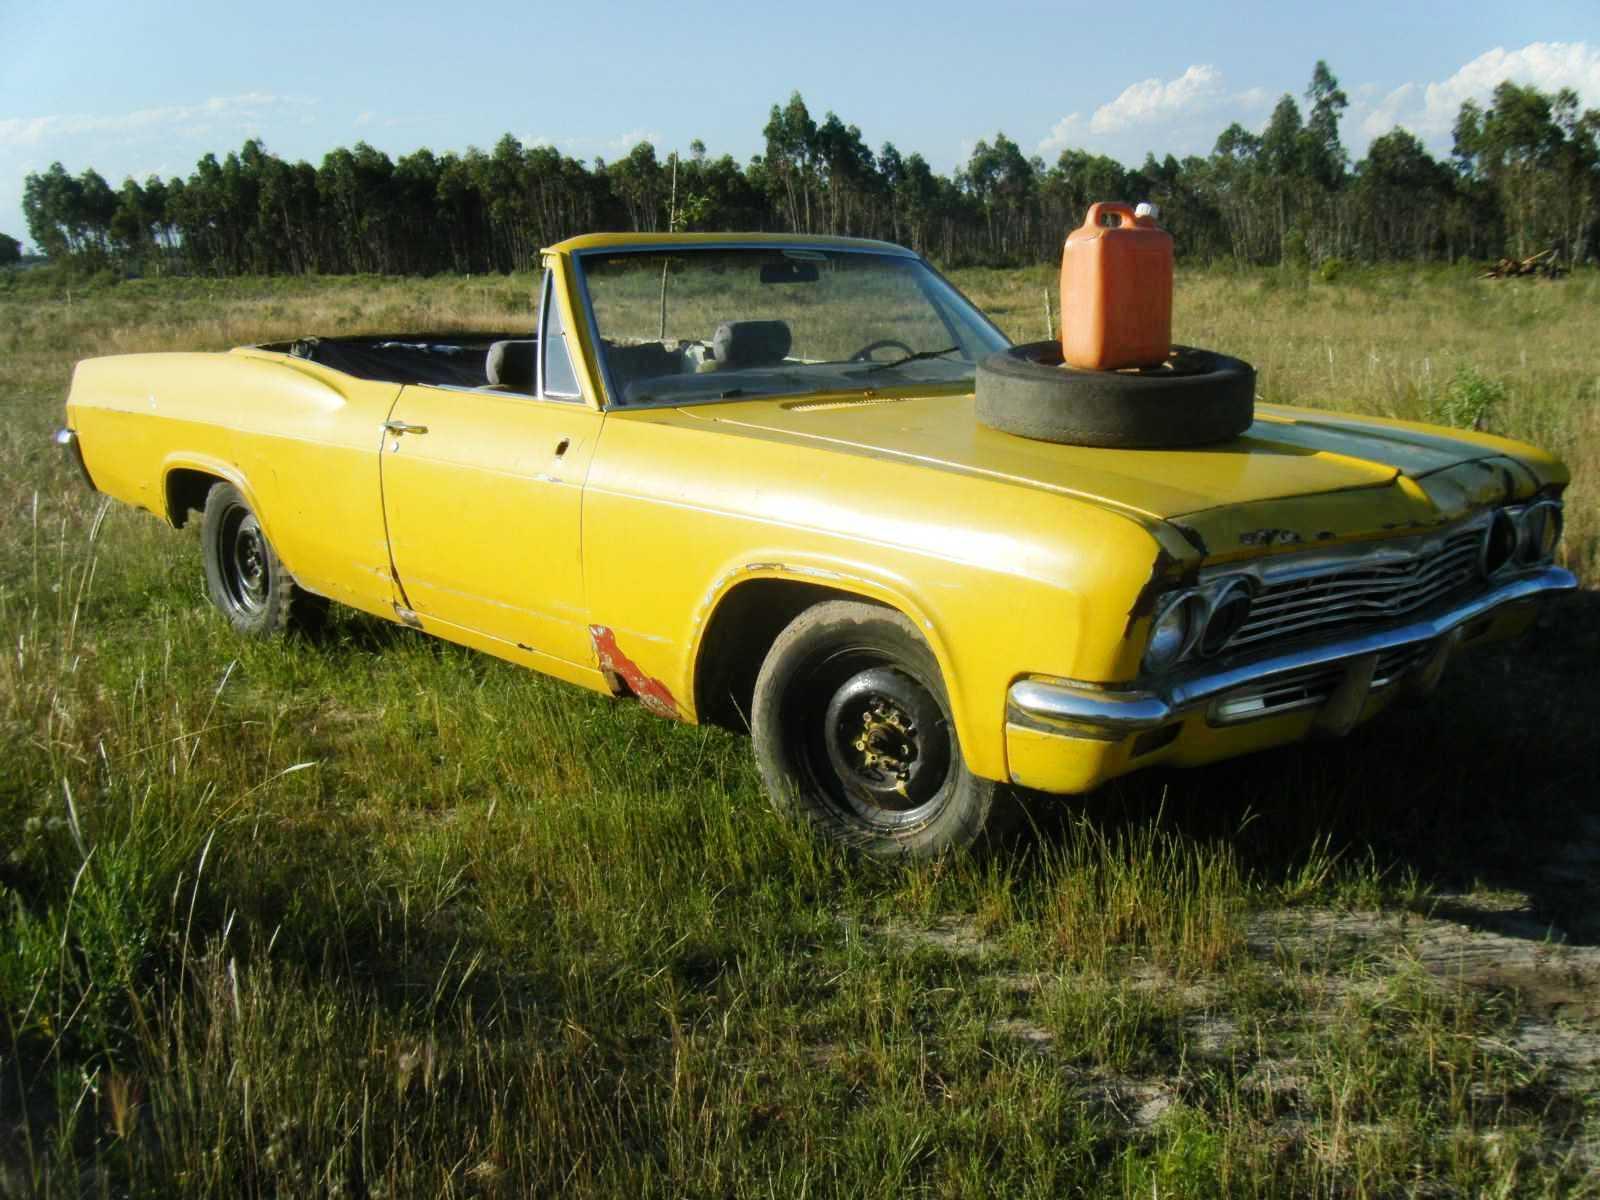 upablo-chevrolet-1966 Chevrolet Impala (1966 - convertible)